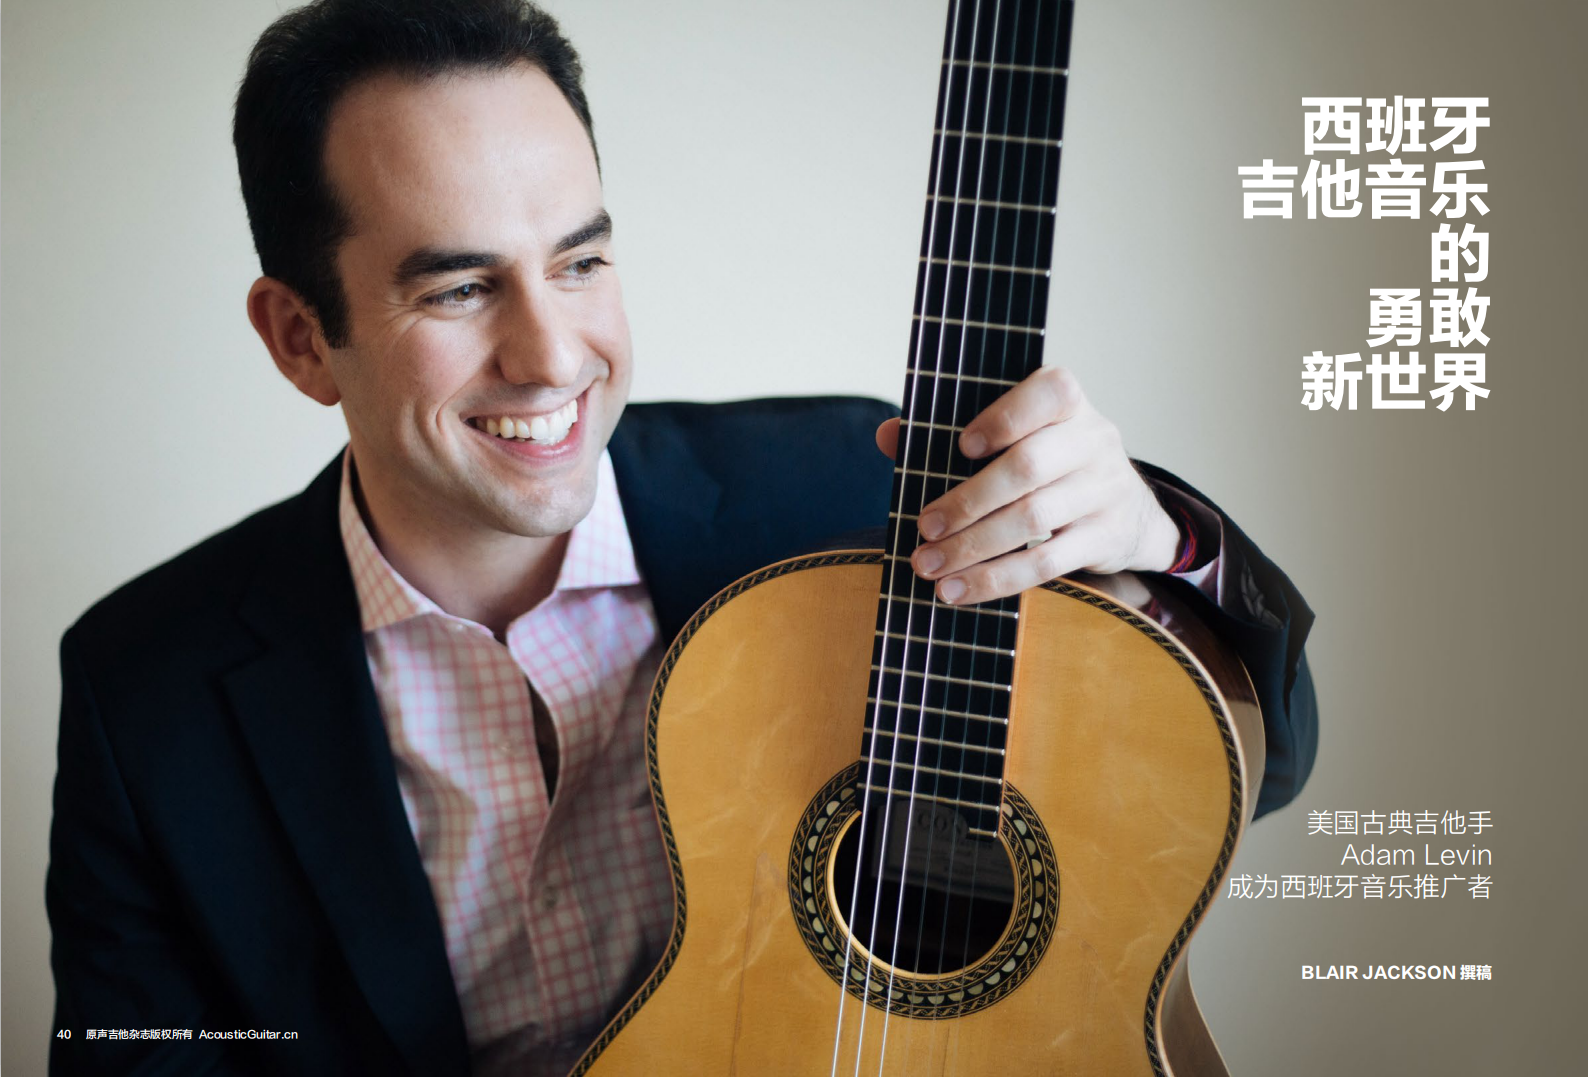 [AG专题]美国古典吉他手Adam Levin成为西班牙音乐推广者